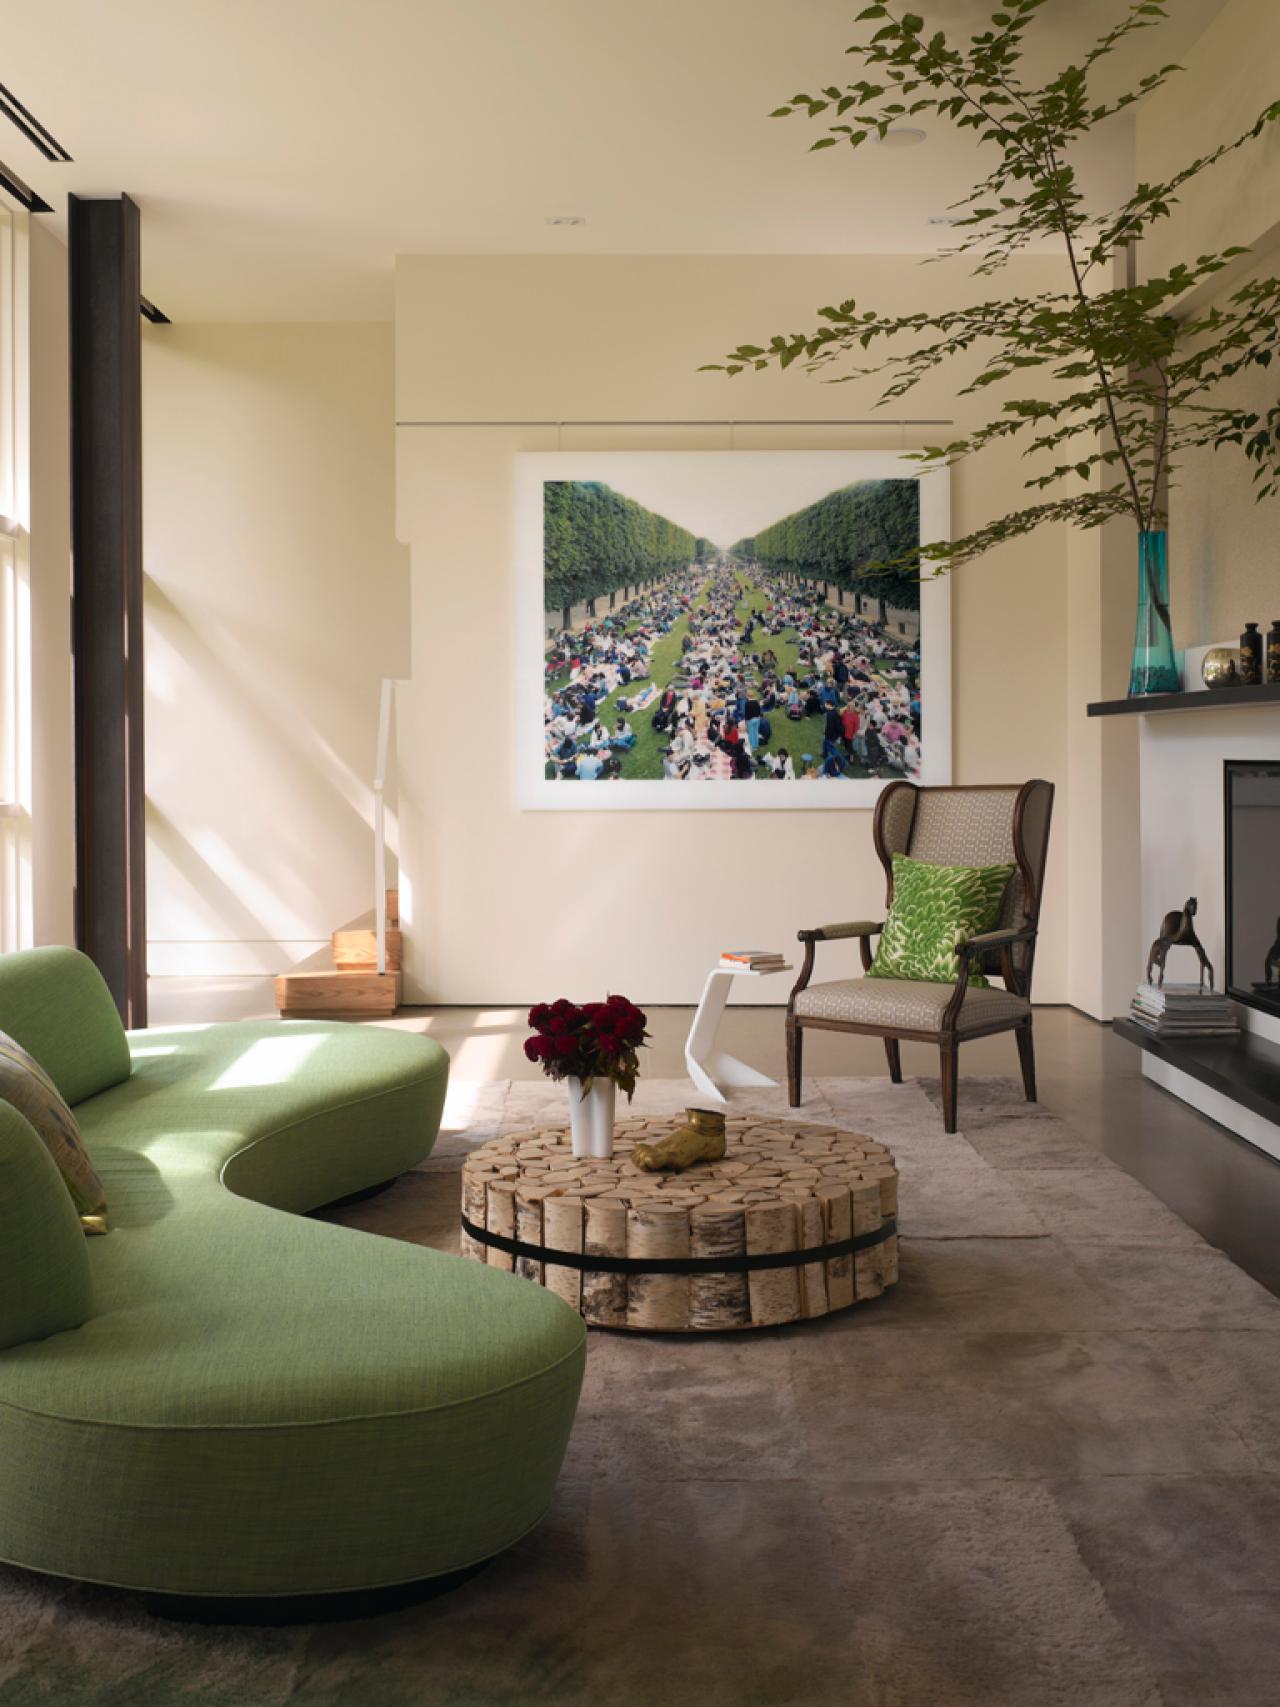 Круглый зеленый диван